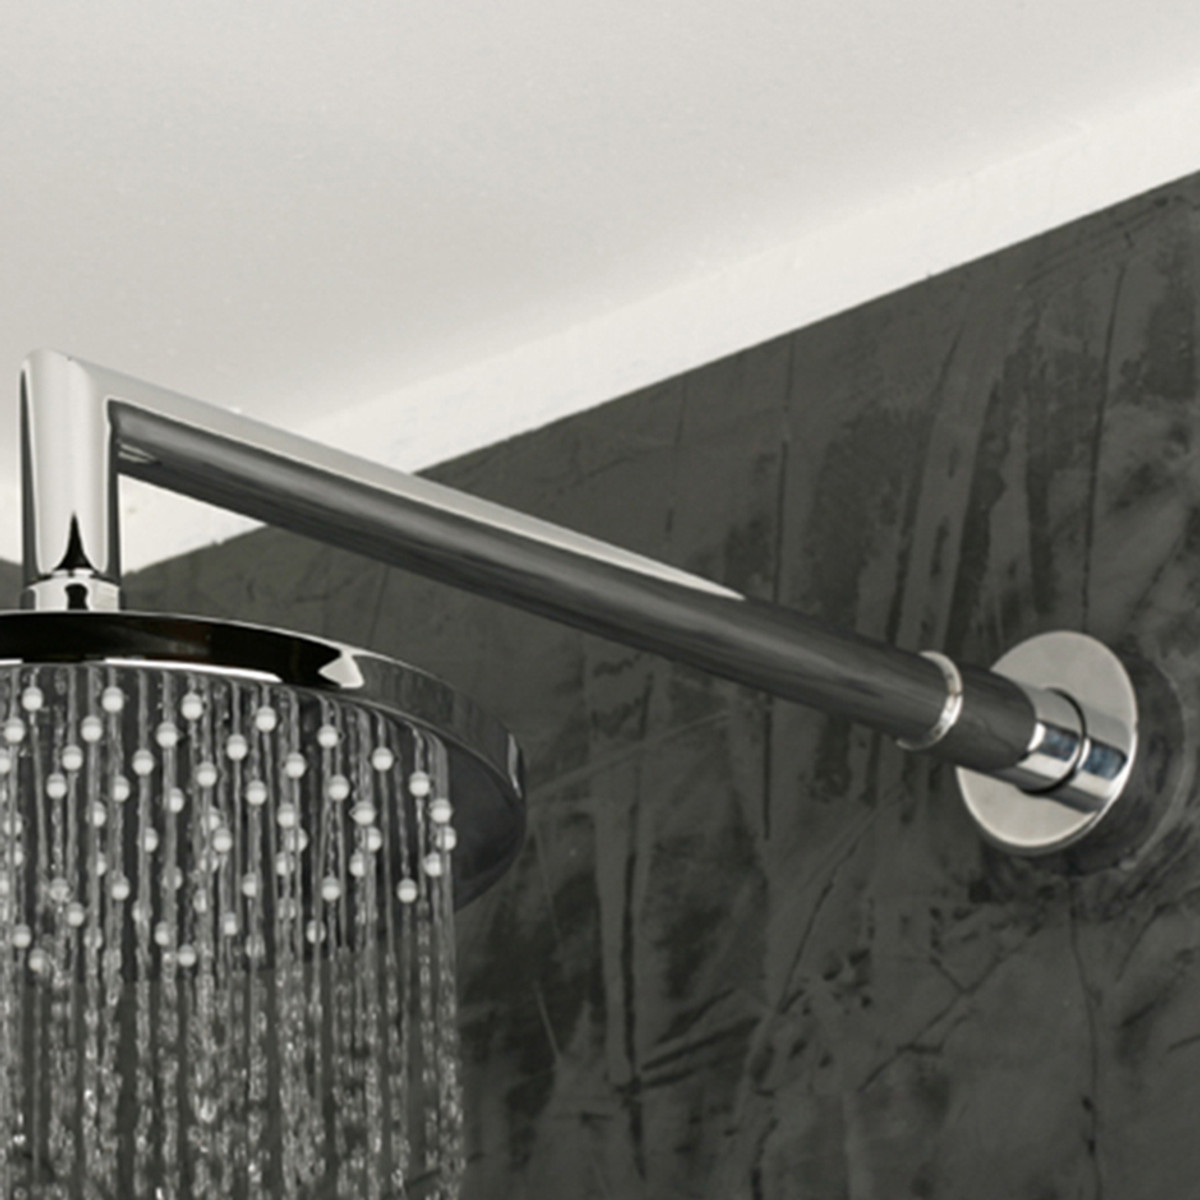 0171 Minimal Shower Arm